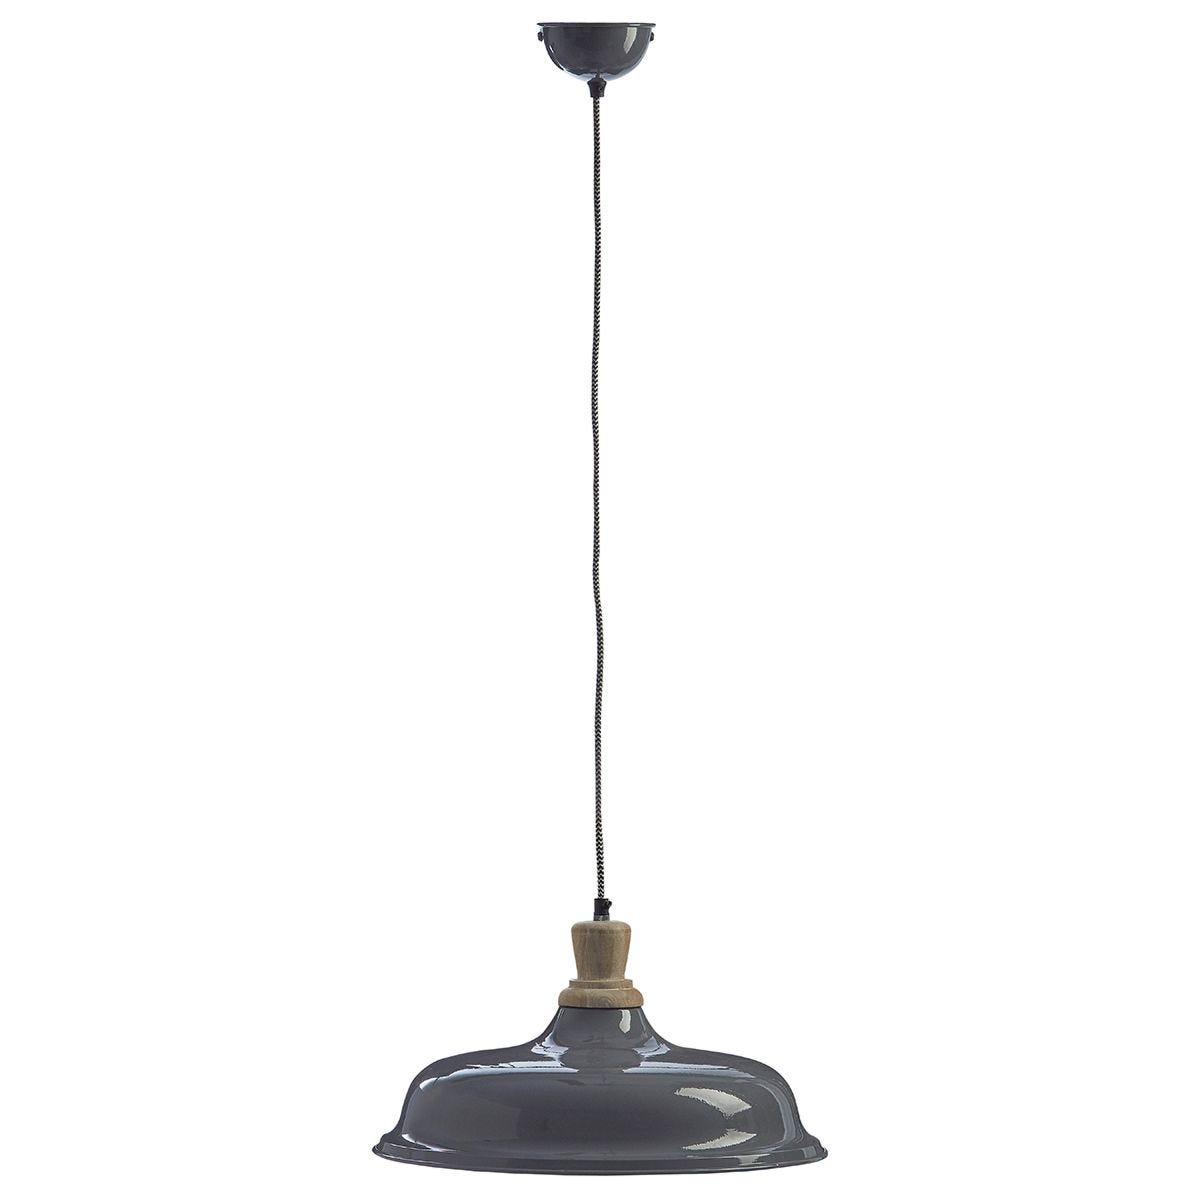 Premier Housewares Oslo Small Pendant Light in Iron/Wood - Grey